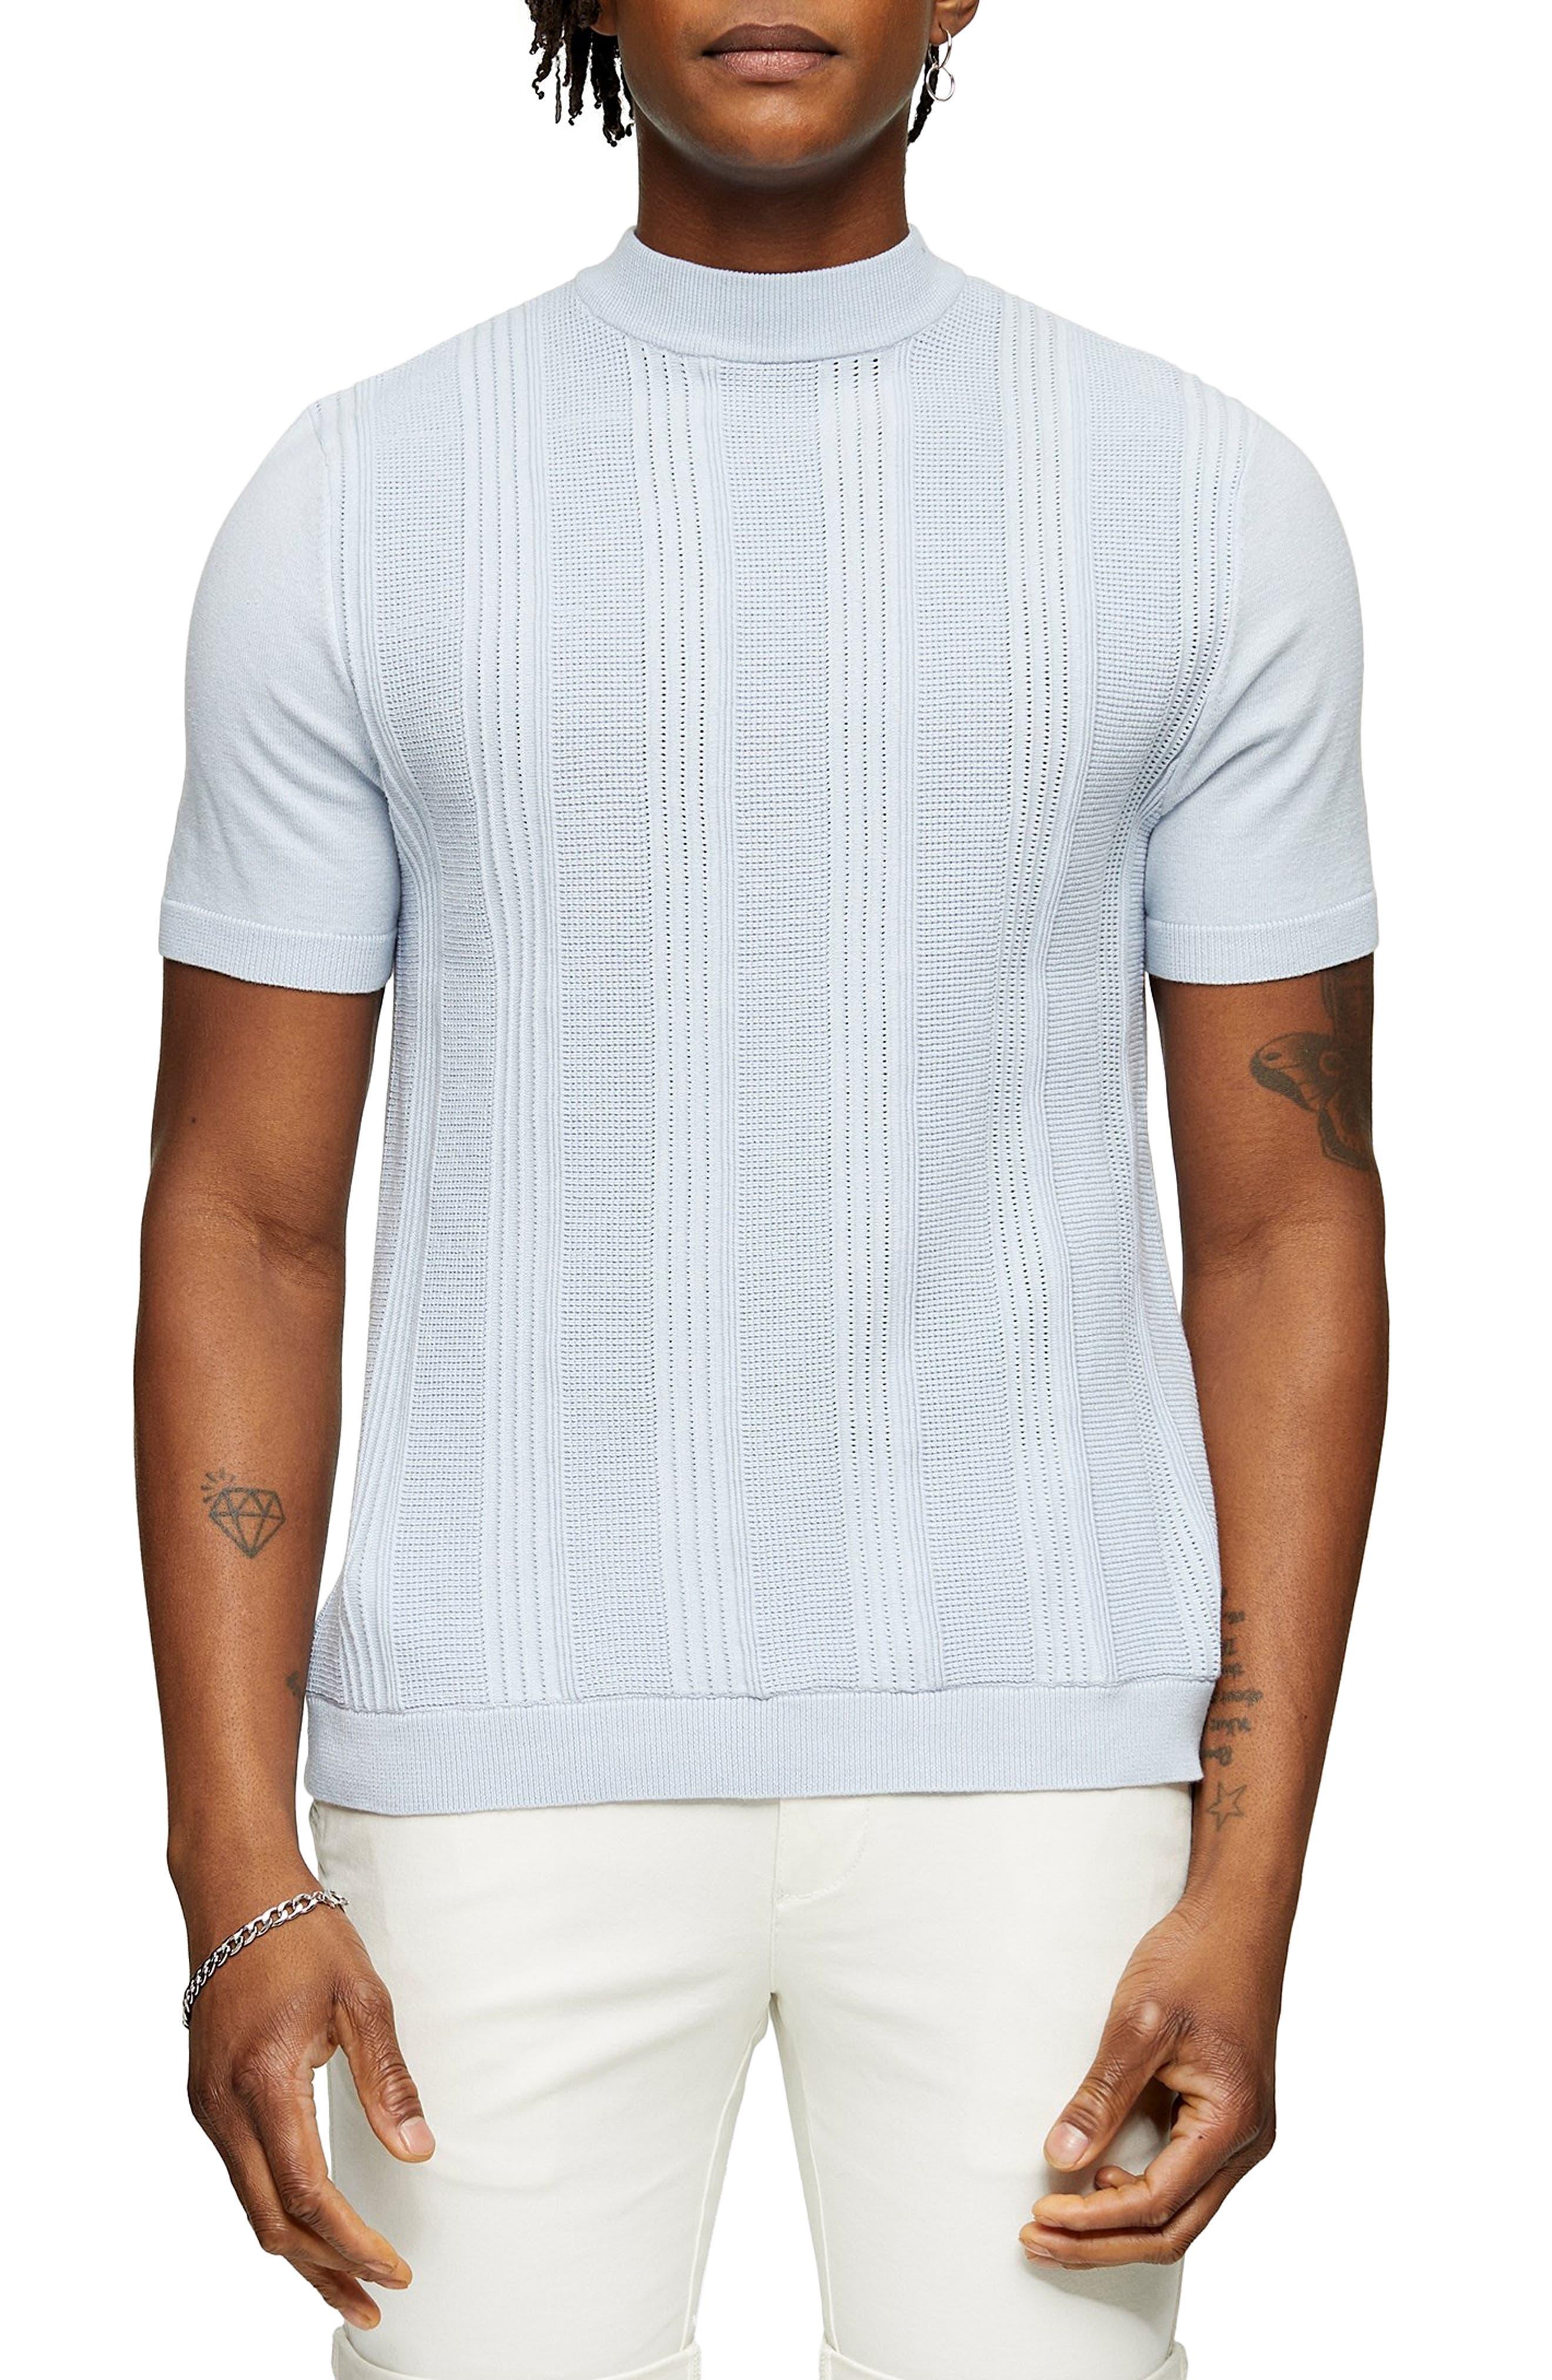 Mens Vintage Shirts – Retro Shirts Mens Topman Mock Neck Short Sleeve Sweater Size XX-Large - Blue $40.00 AT vintagedancer.com